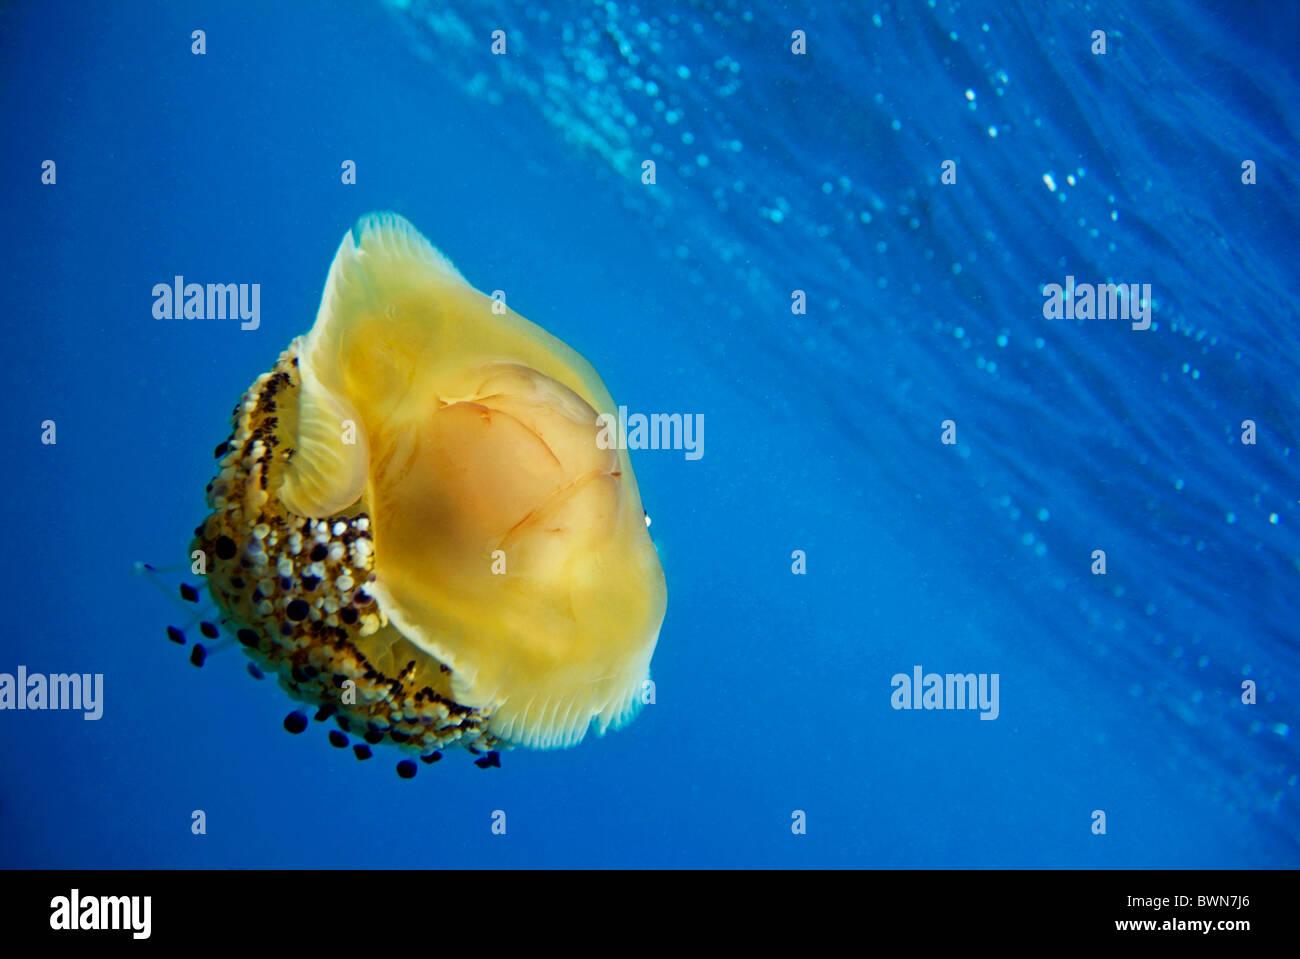 Fried Egg Jellyfish (Cotylorhiza tuberculata) swimming in blue waters, Mediterranean Sea, Europe - Stock Image